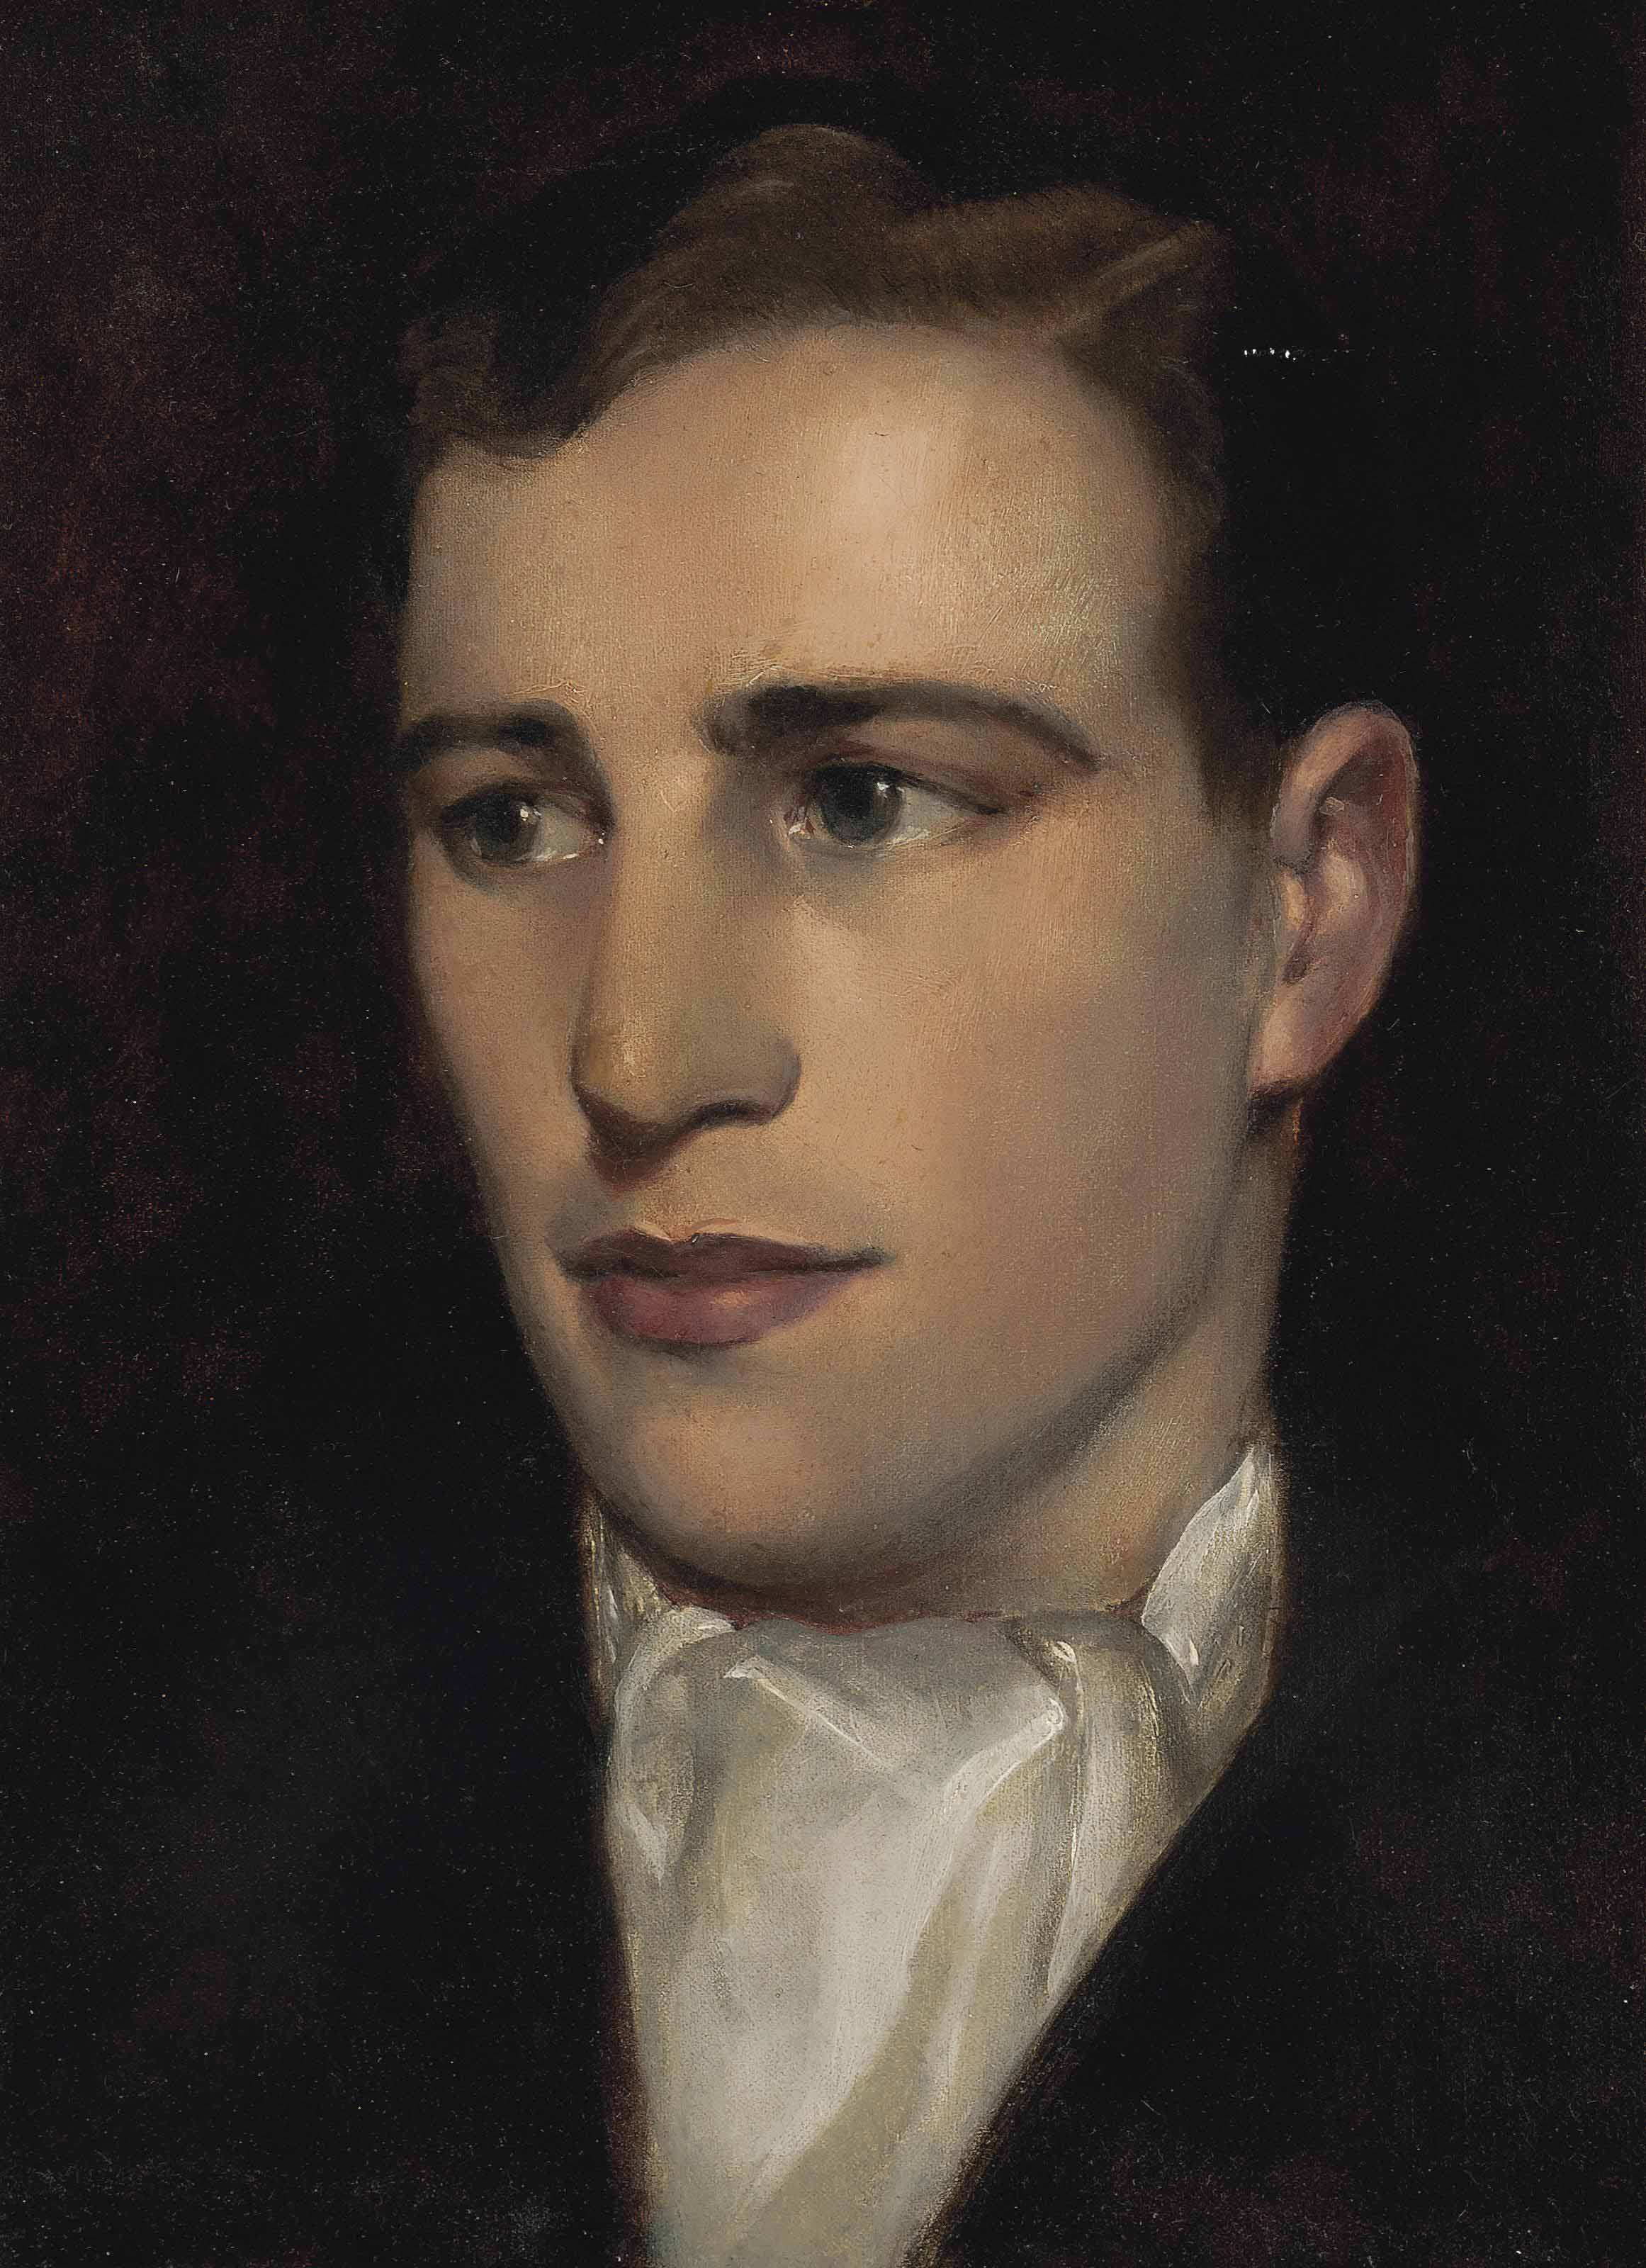 Portrait of the Rt. Rev. Eustace Anthony Morrogh Bernard (1893-1972), bust-length, wearing a white cravat